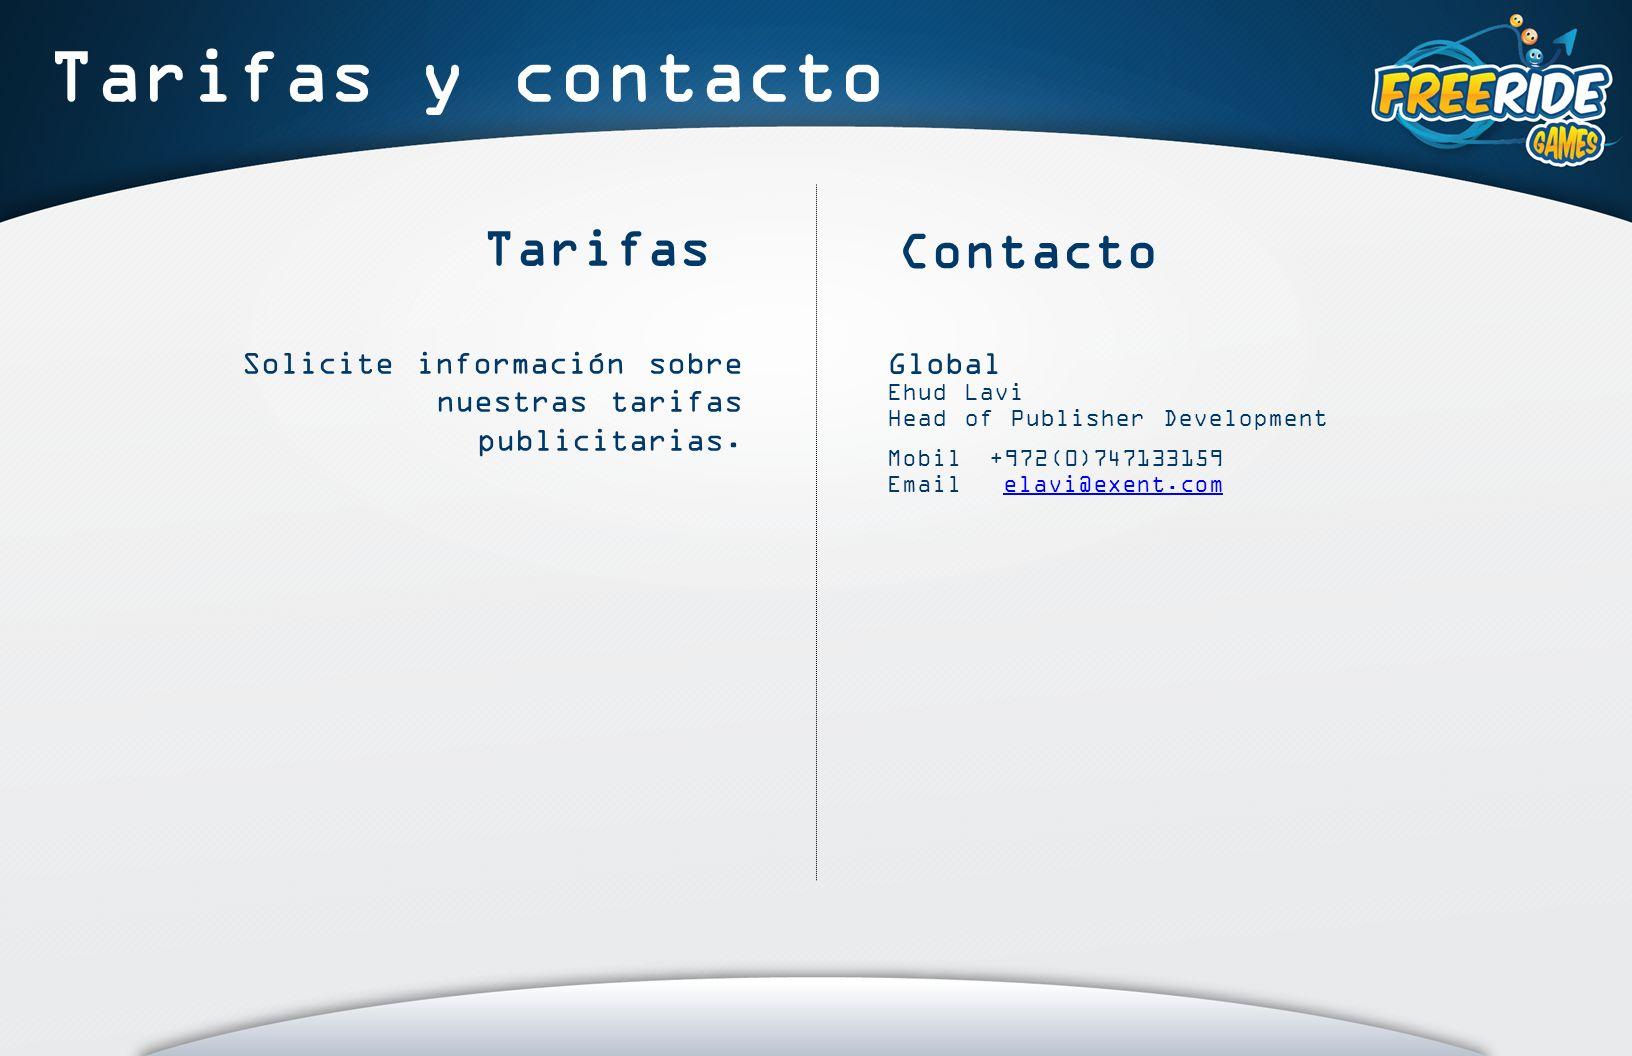 Tarifas y contacto Contacto Global Ehud Lavi Head of Publisher Development Mobil +972(0)747133159 Email elavi@exent.comelavi@exent.com Tarifas Solicite información sobre nuestras tarifas publicitarias.